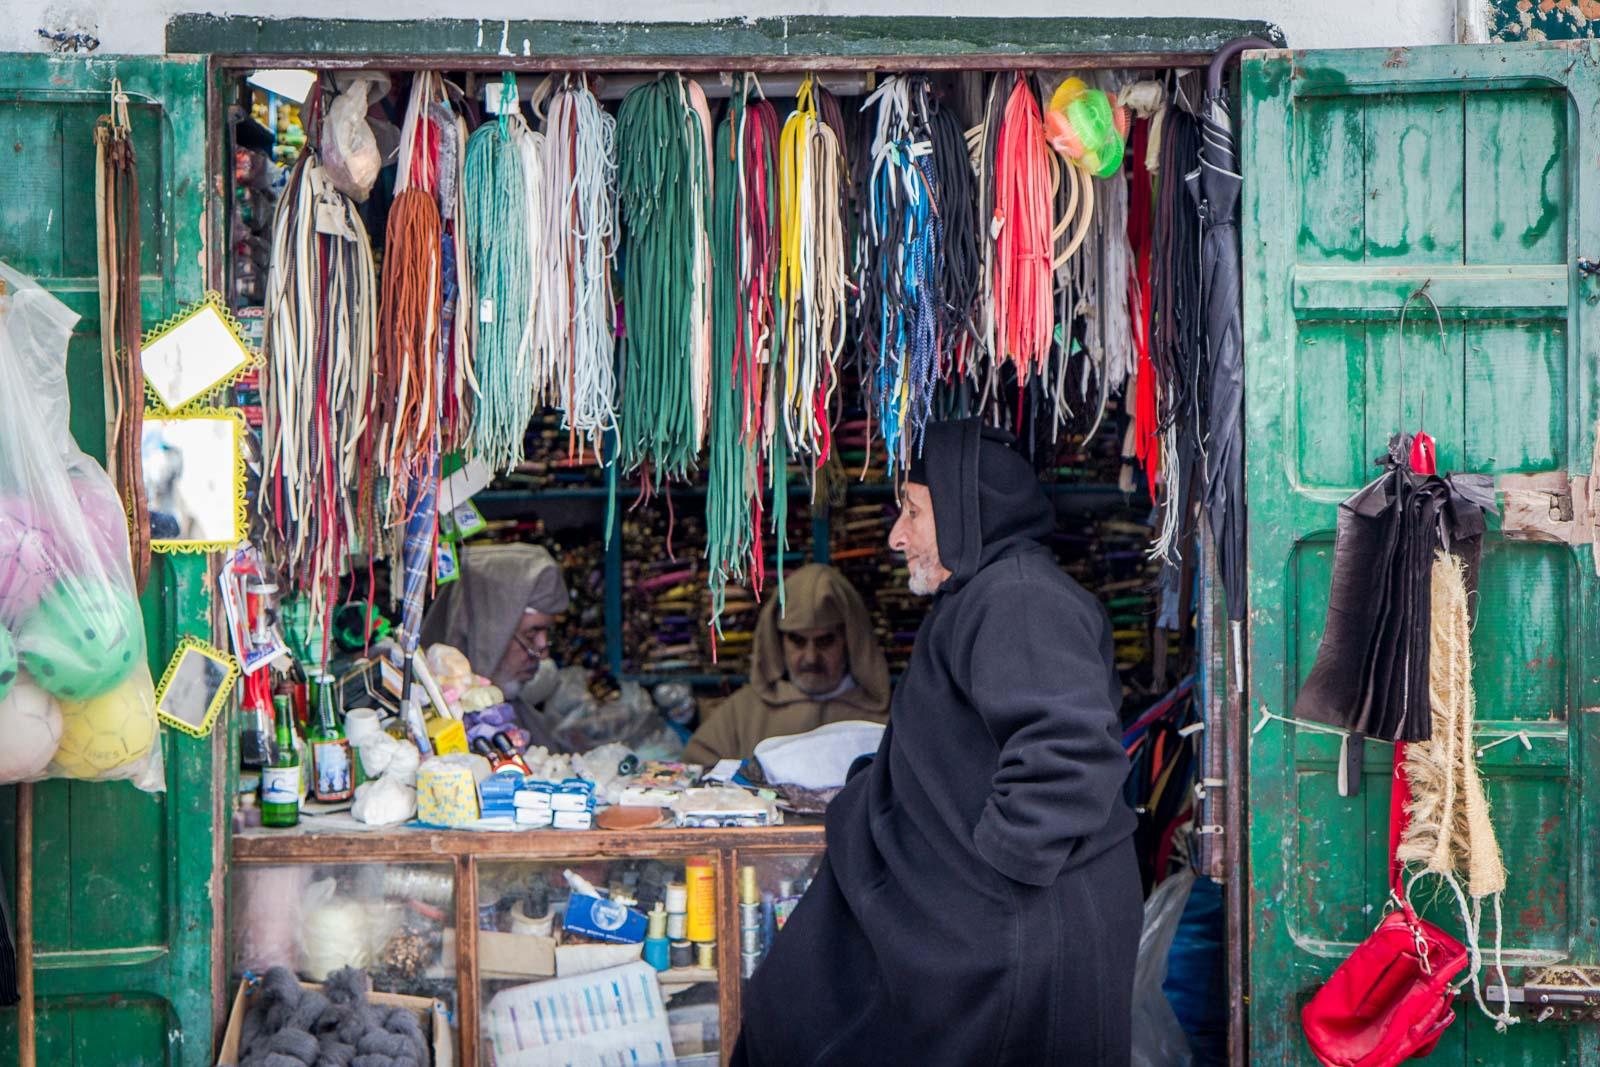 Local market in Tetouan, Morocco